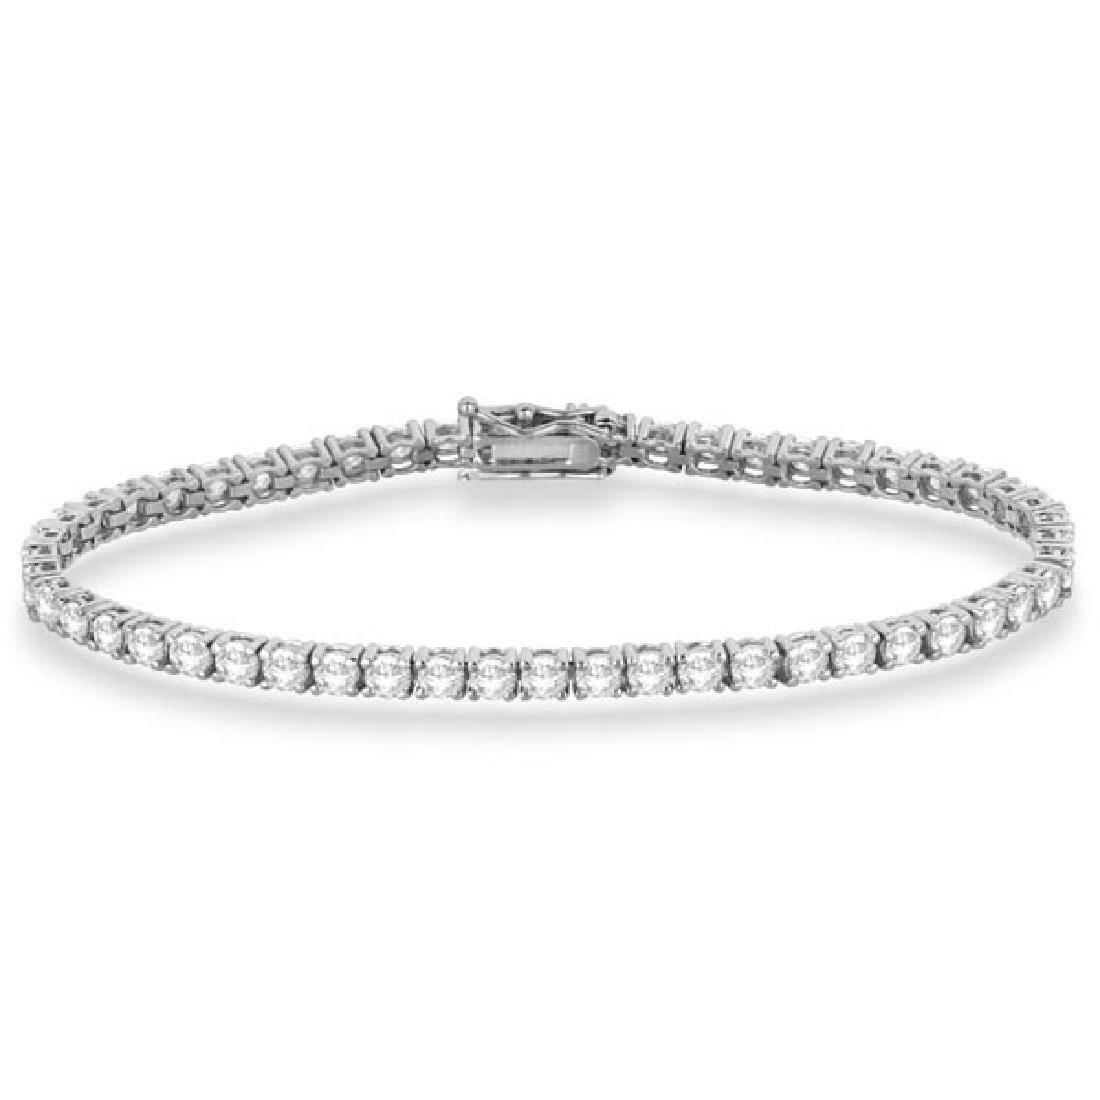 Eternity Diamond Tennis Bracelet 14k White Gold (7.08ct